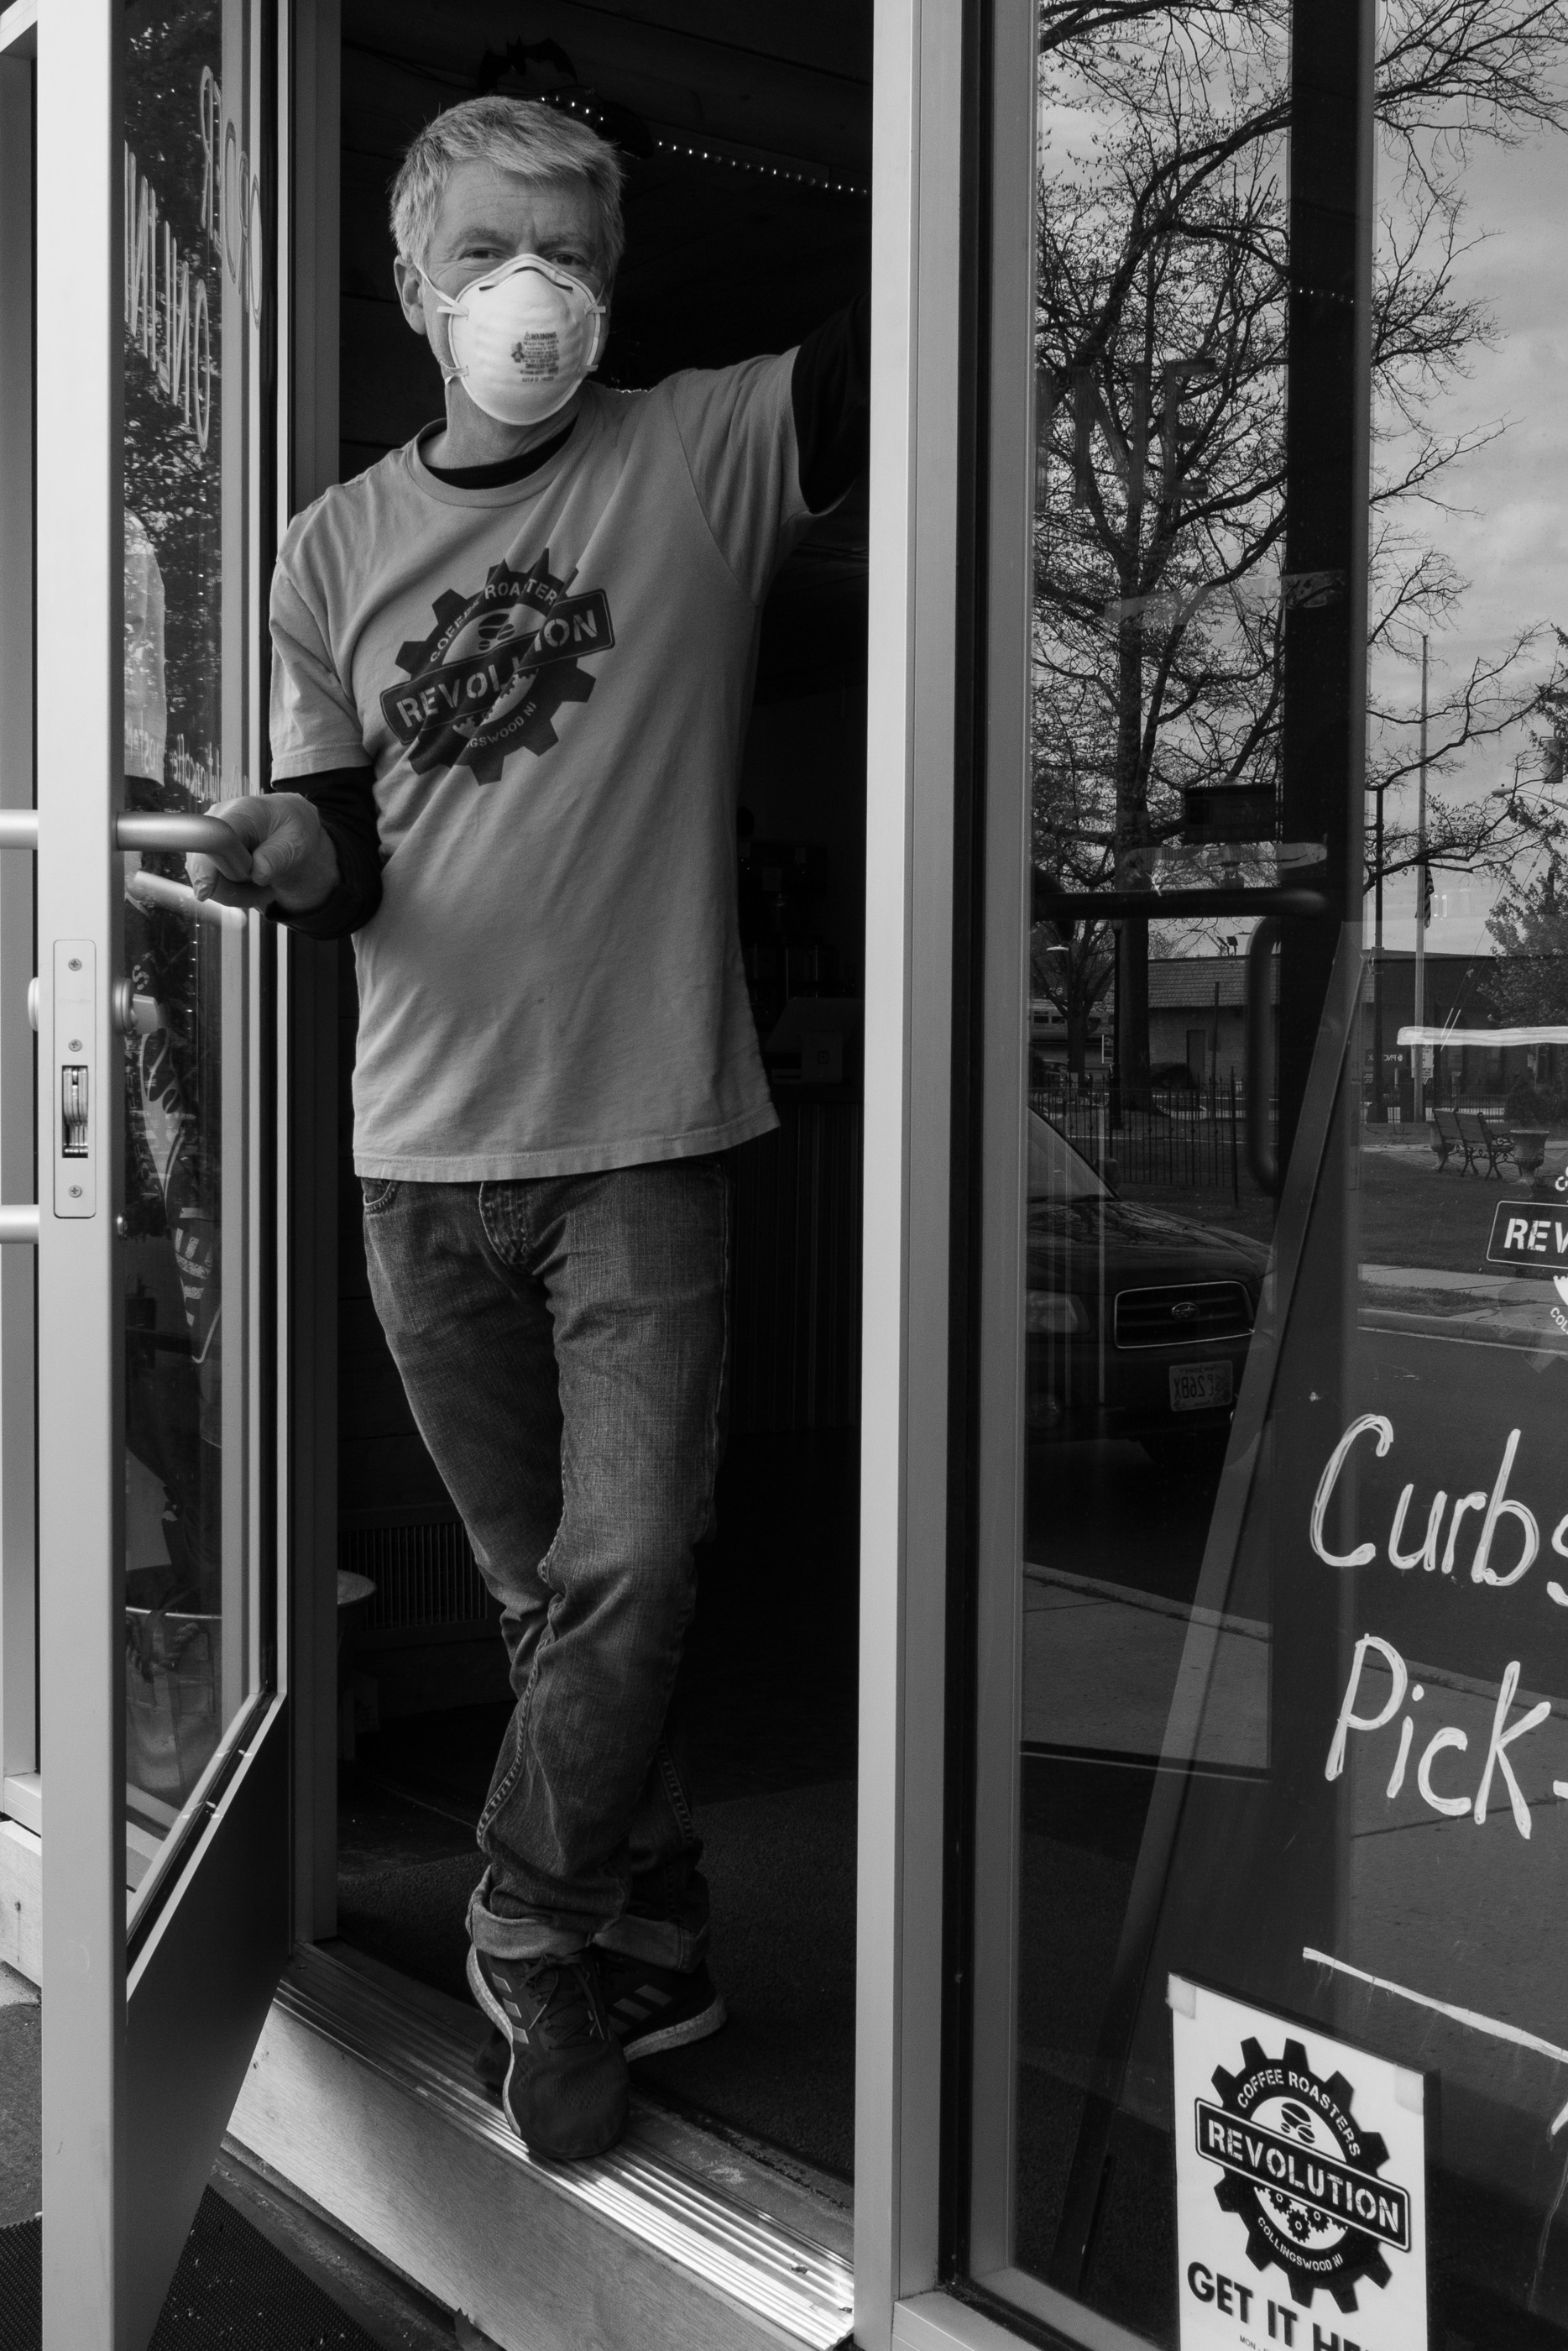 Covid-19: Steve McFadden of Revolution Coffee Roasters